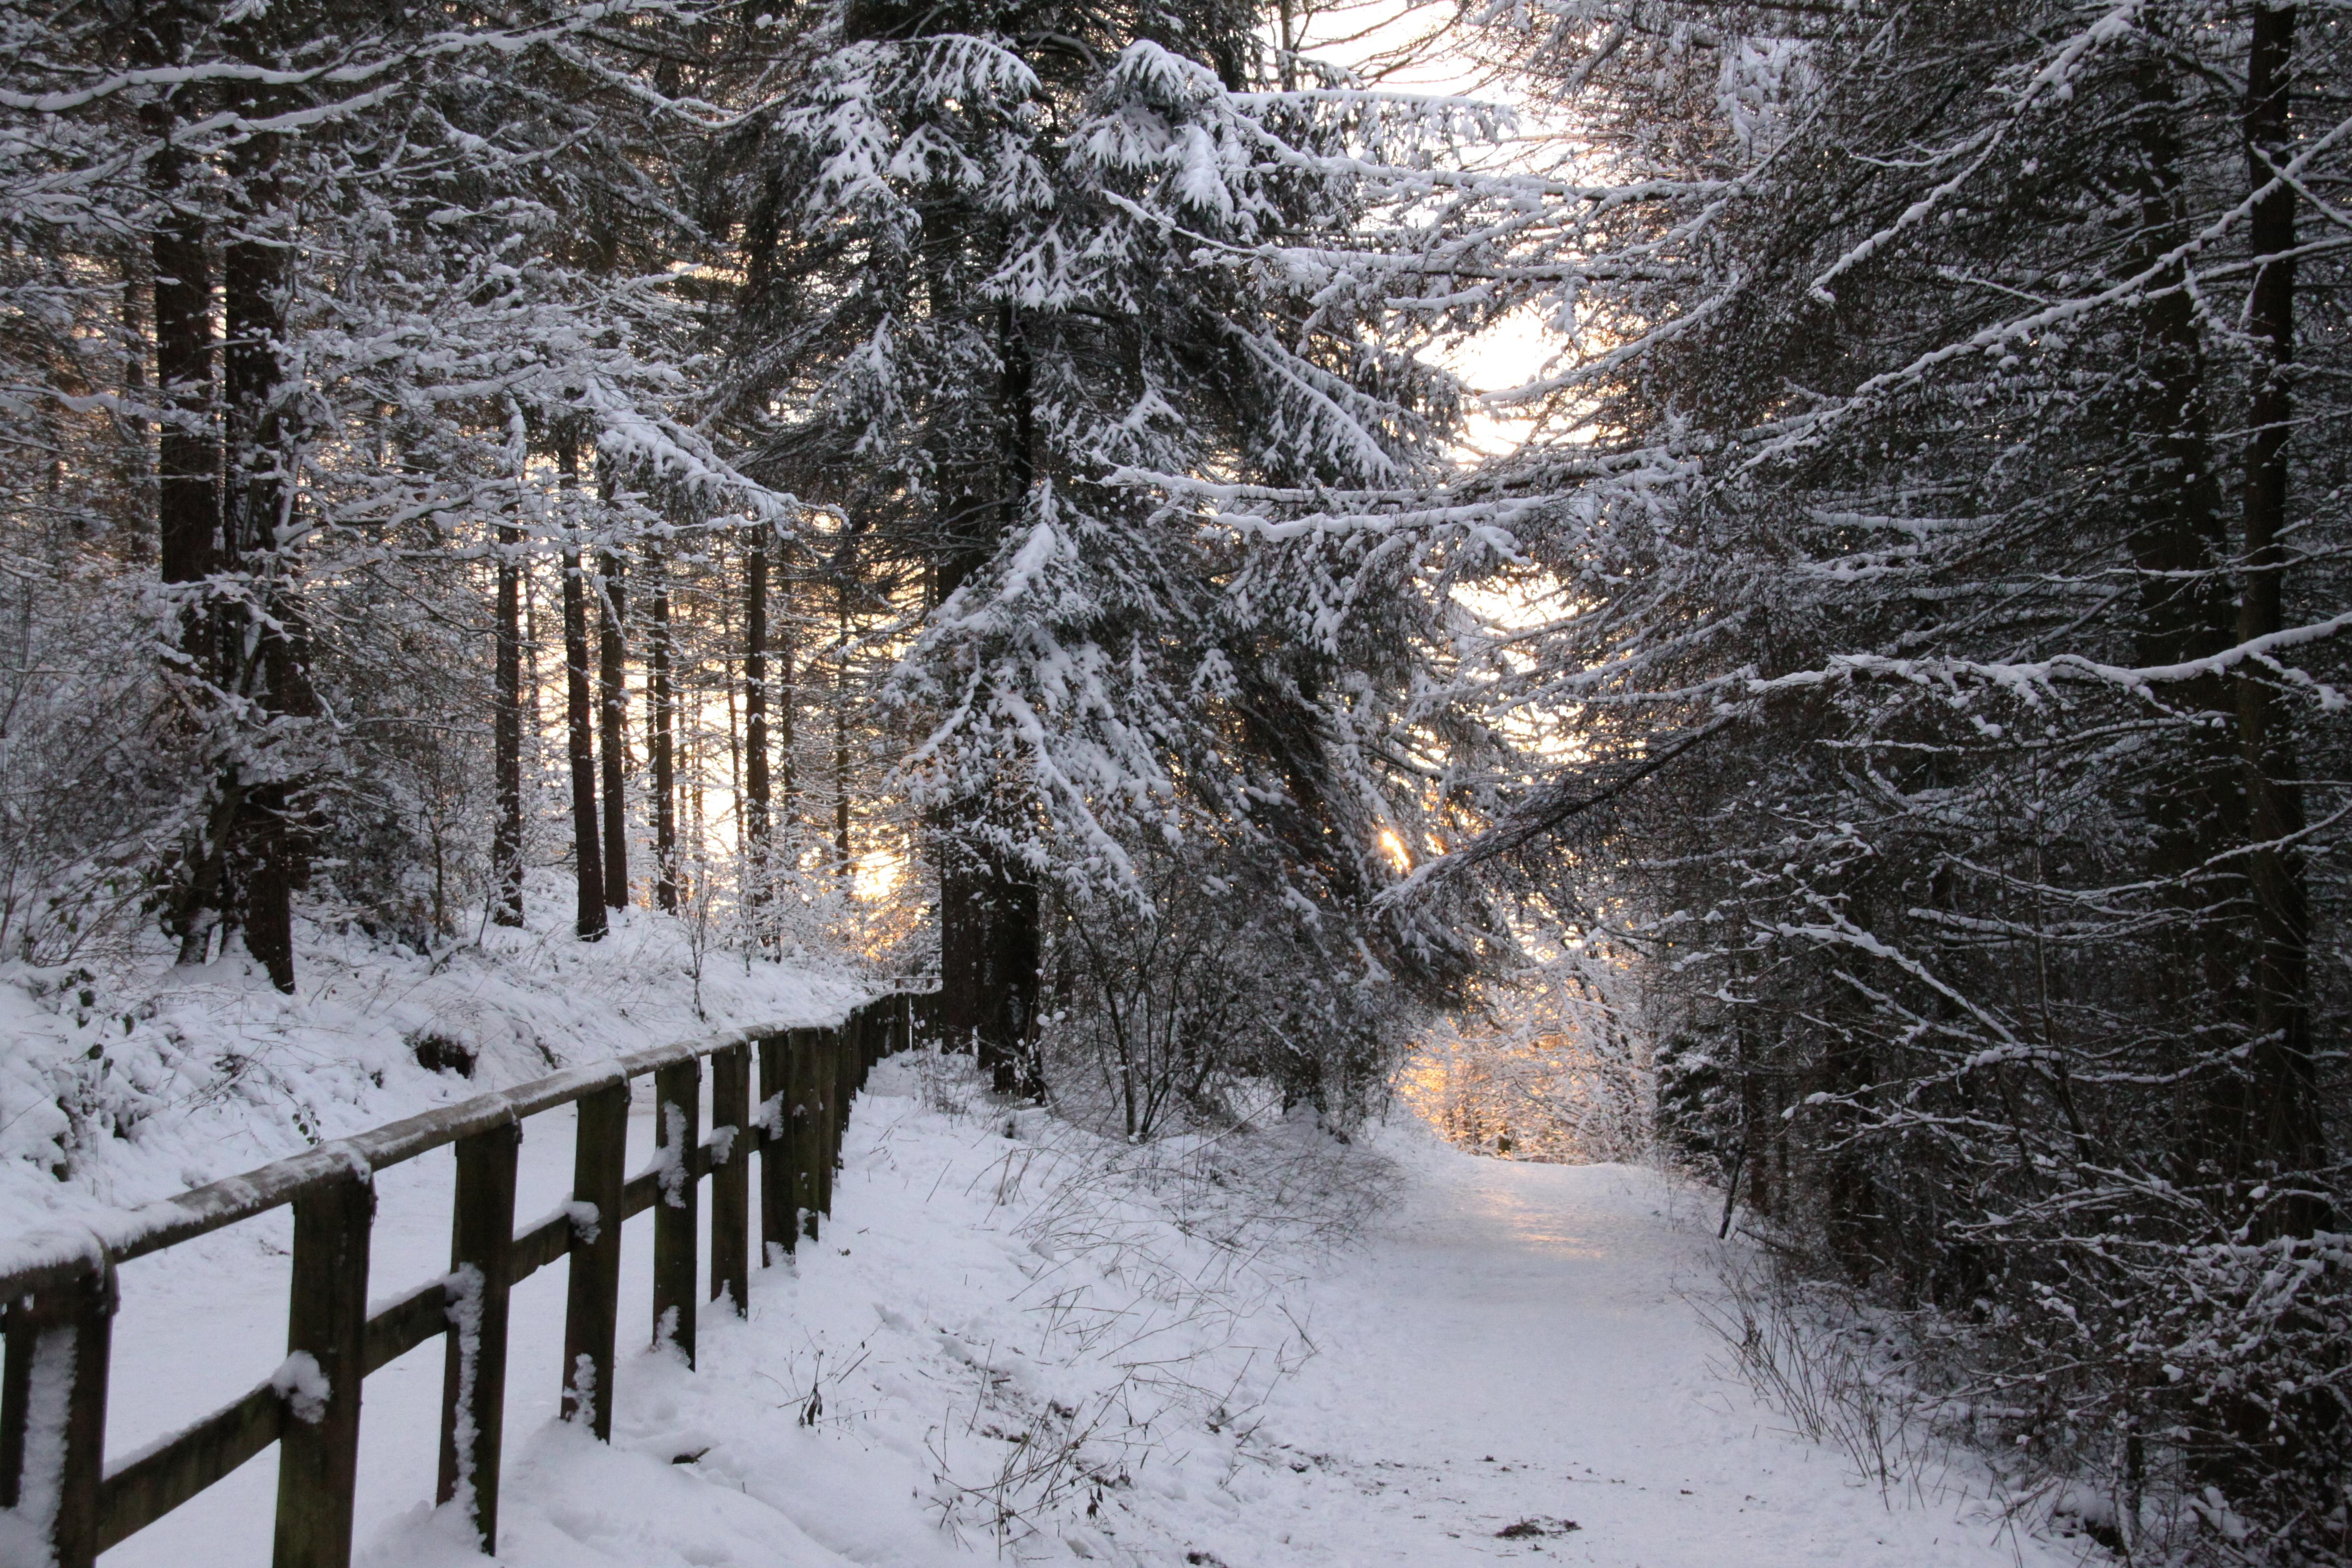 File:Winter path (3258772986).jpg - Wikimedia Commons